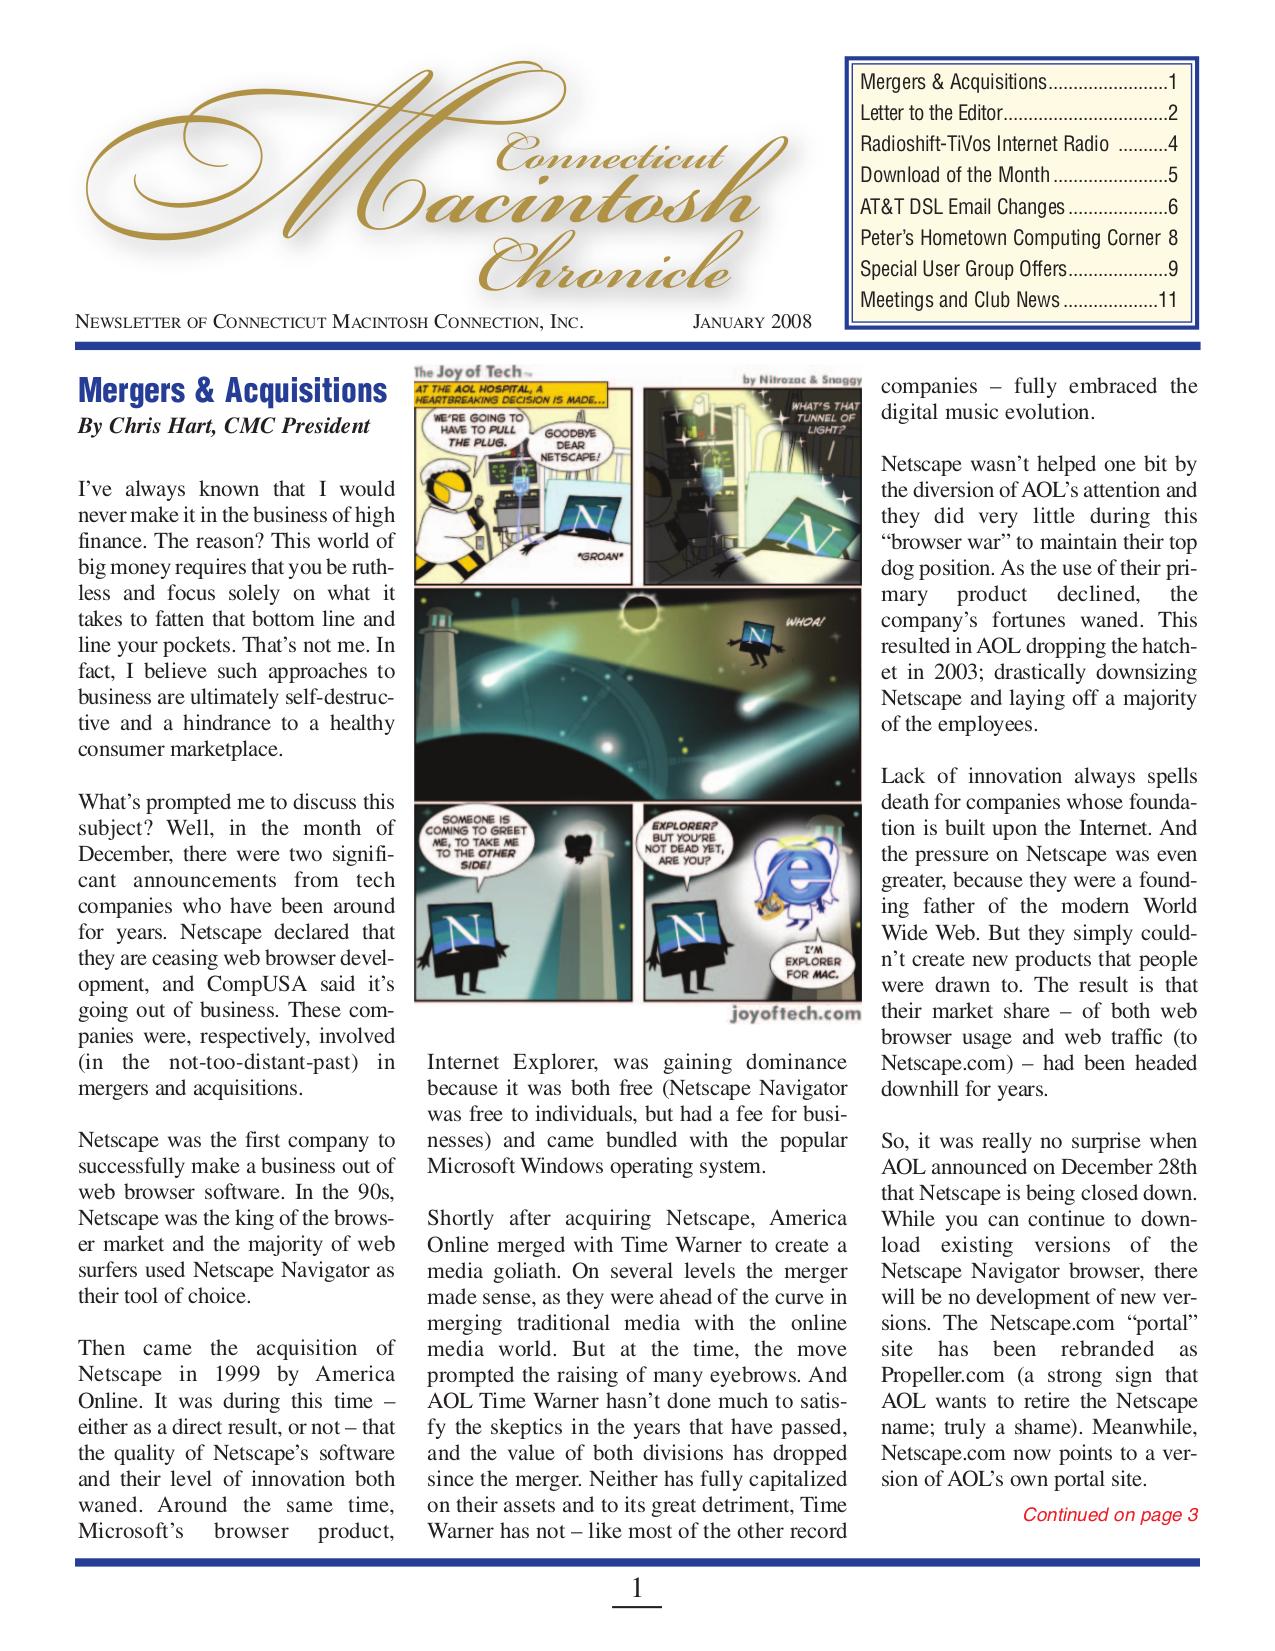 pdf for LaCie Storage 301313U manual